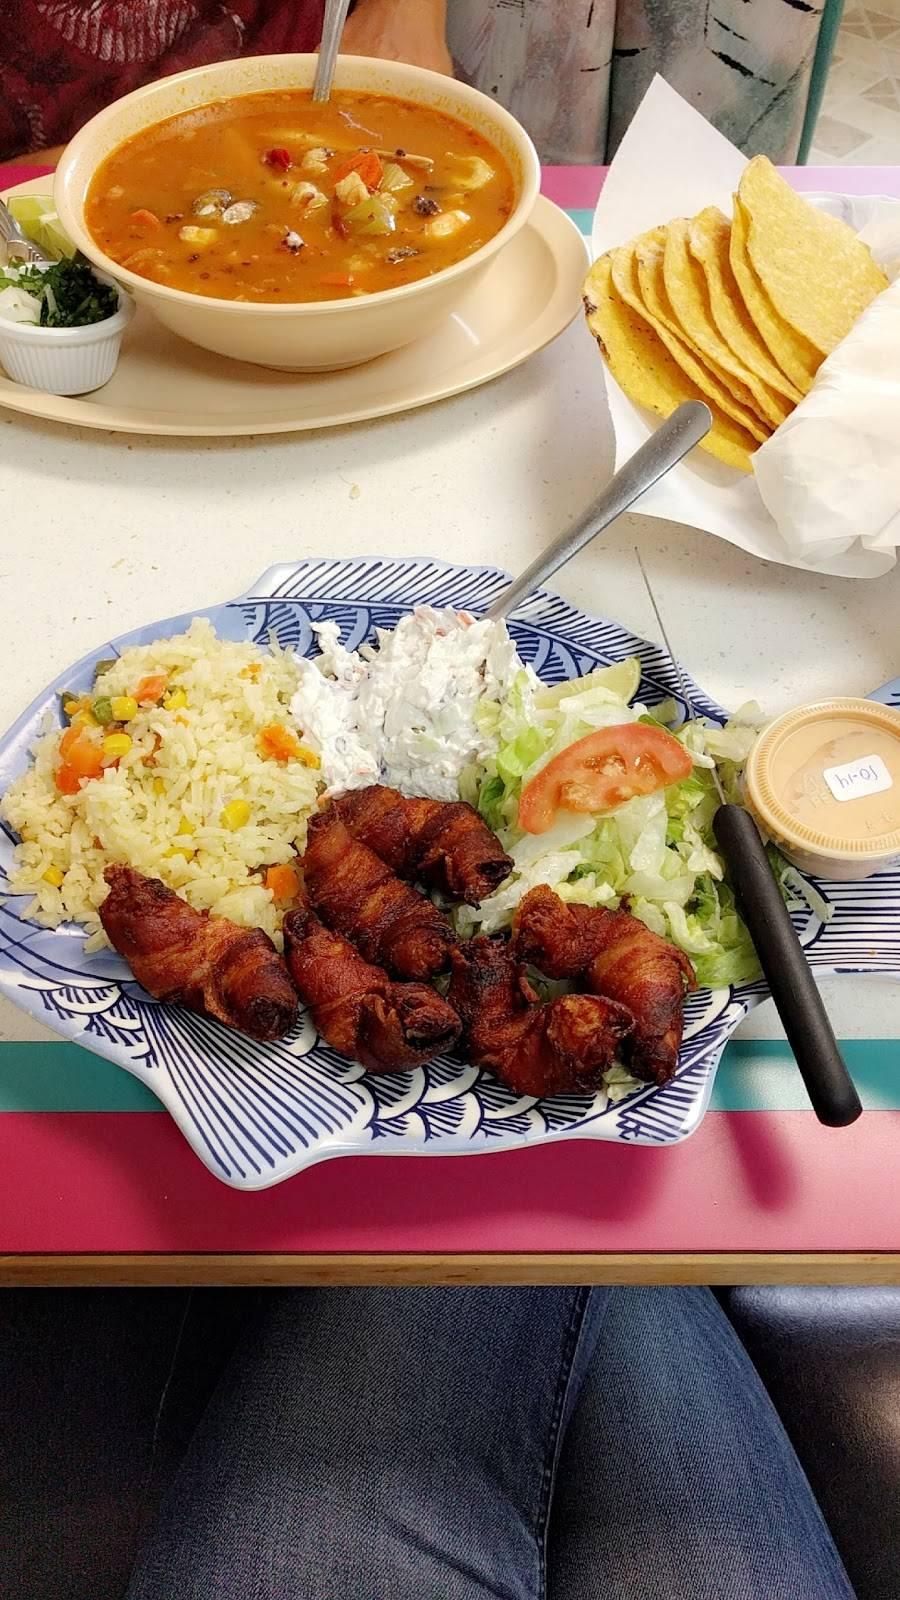 Mariscos Cheli   restaurant   1851 N Broadway, Wichita, KS 67214, USA   3162017240 OR +1 316-201-7240